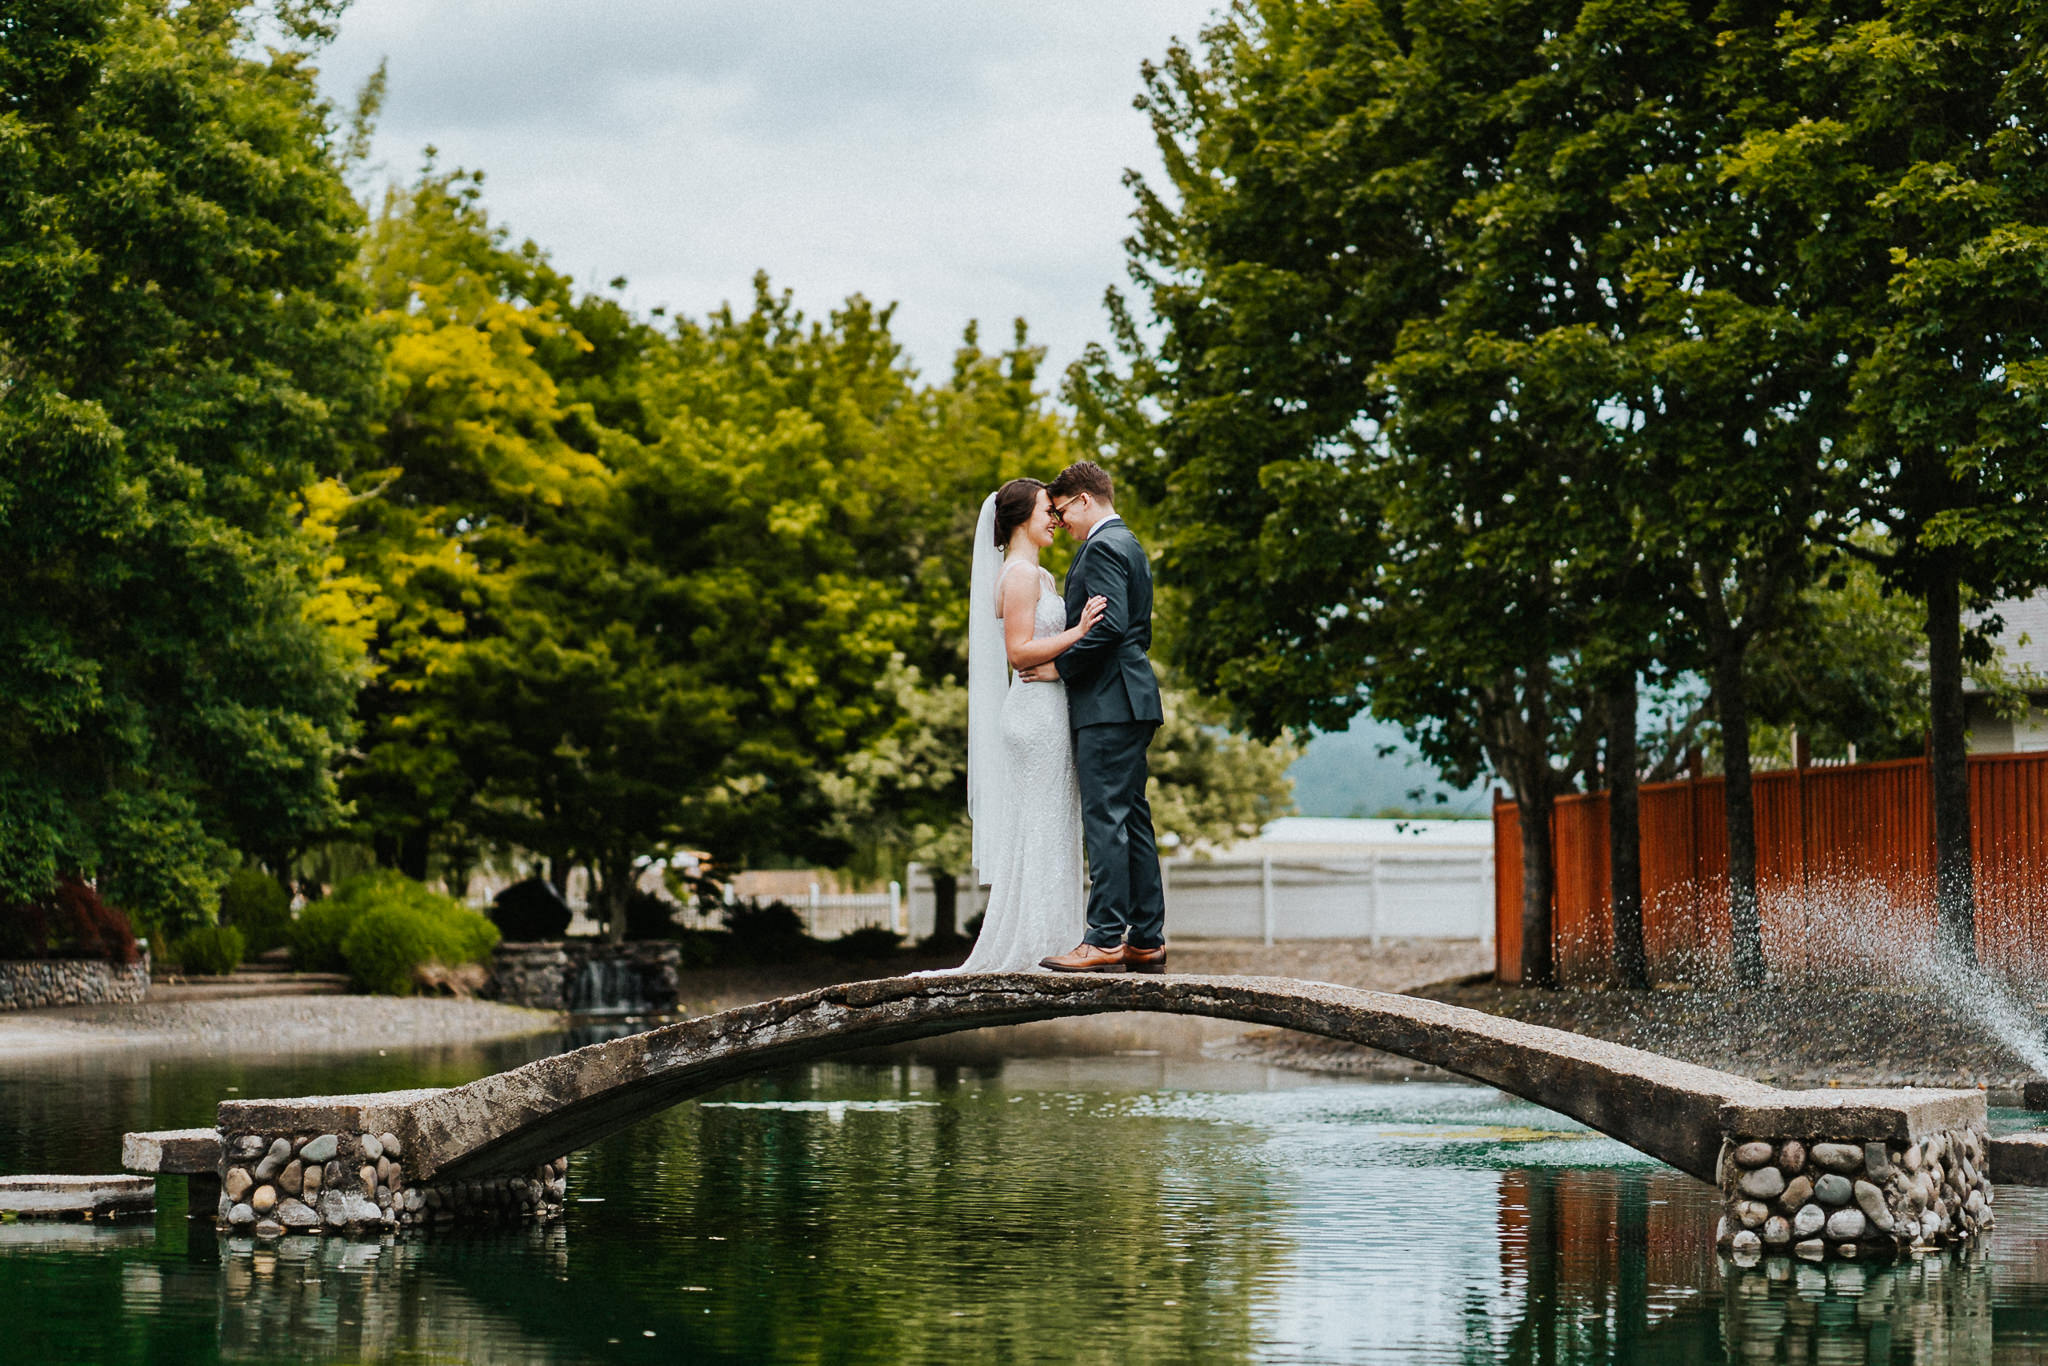 Water Oasis Bridge Fountain Bride Groom Portrait